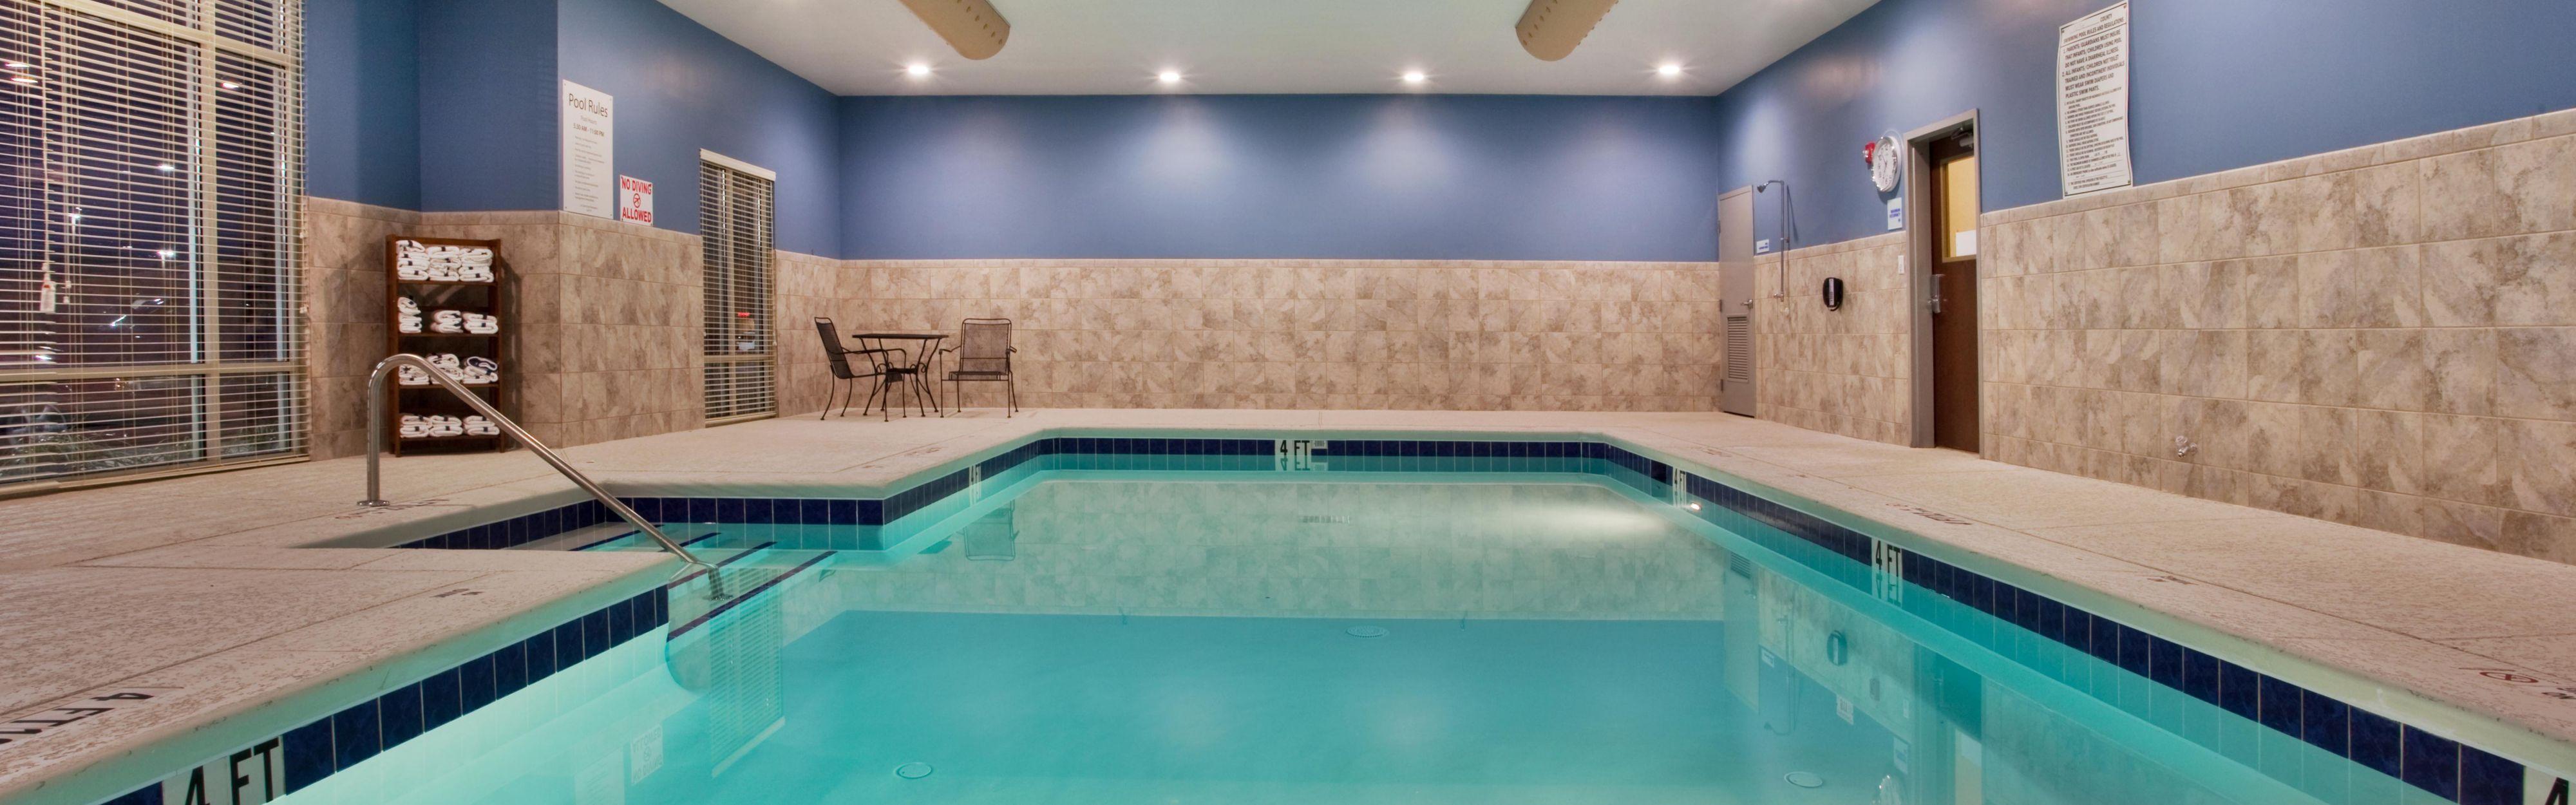 Holiday Inn Express & Suites Atlanta Arpt West - Camp Creek image 2